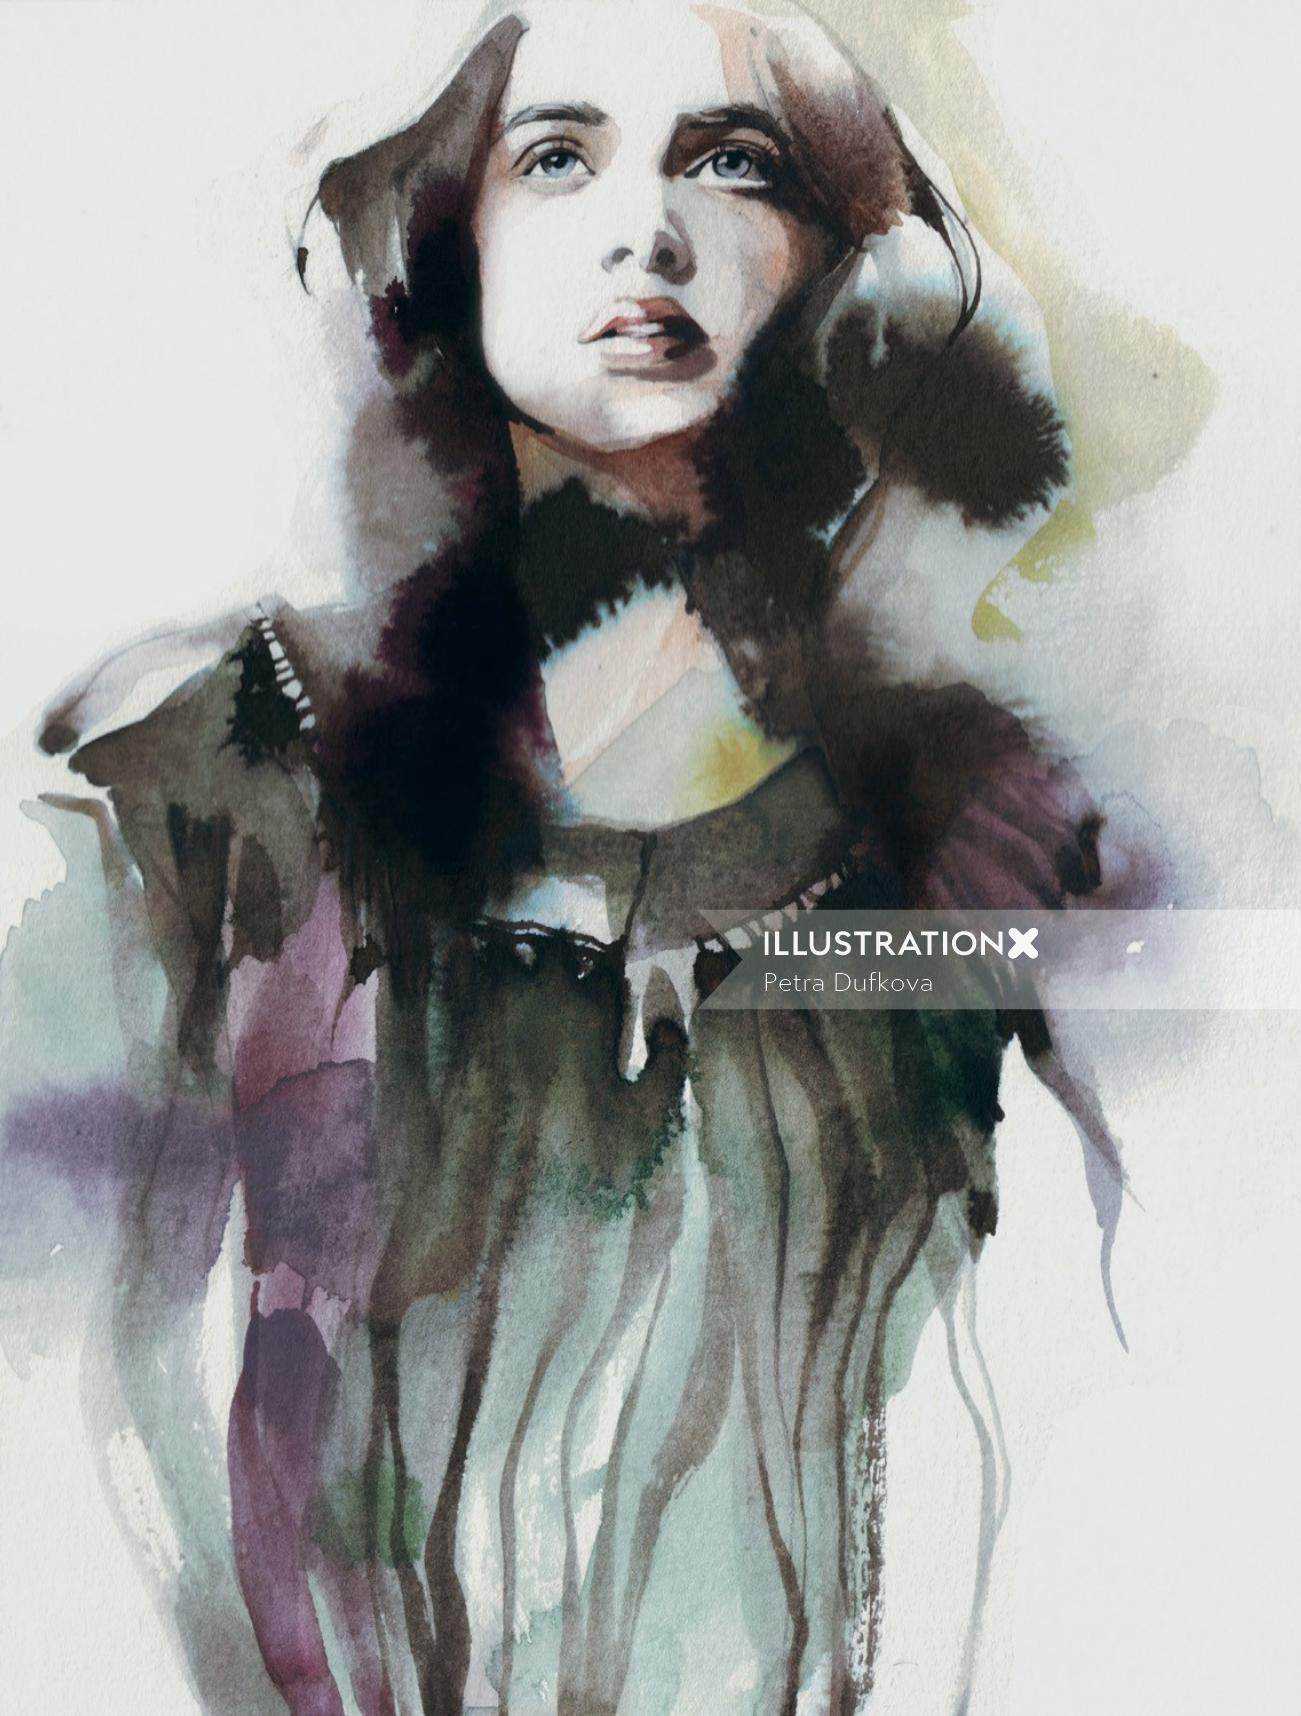 Petra Dufkova illustrator - painting illustration